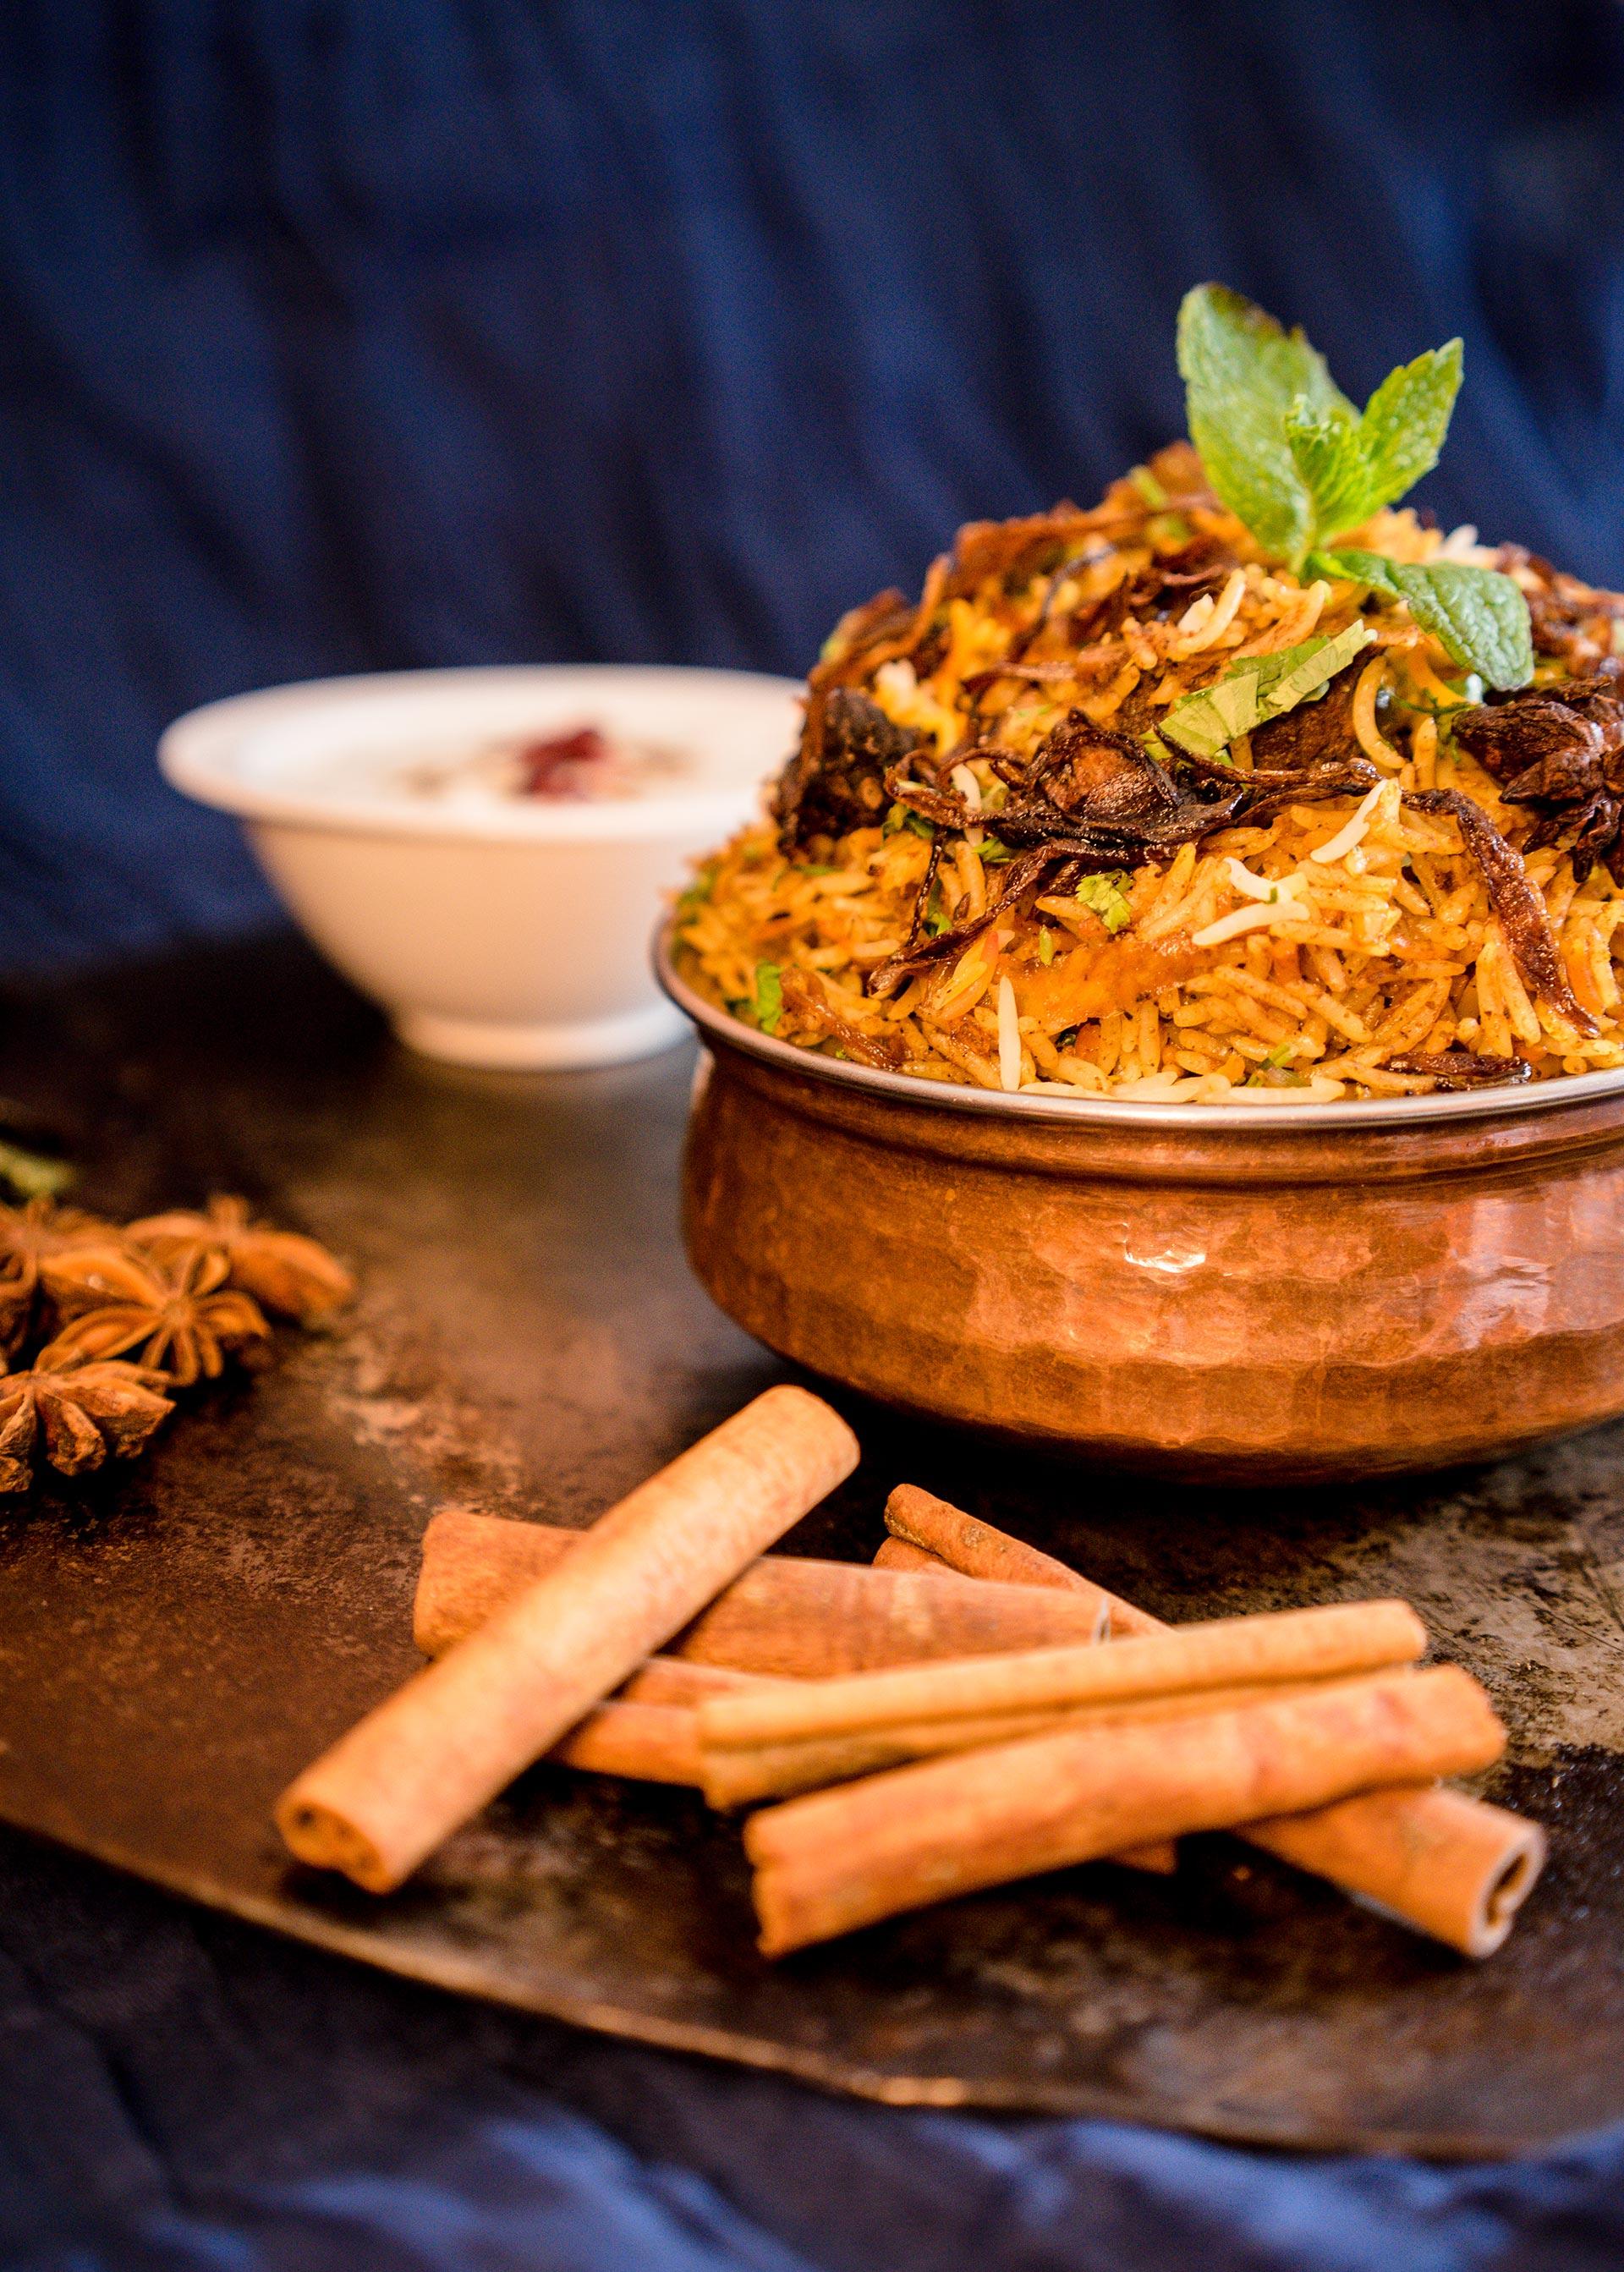 keeva-sf-restaurant-food-photographer-a-few-good-clicks-54.jpg